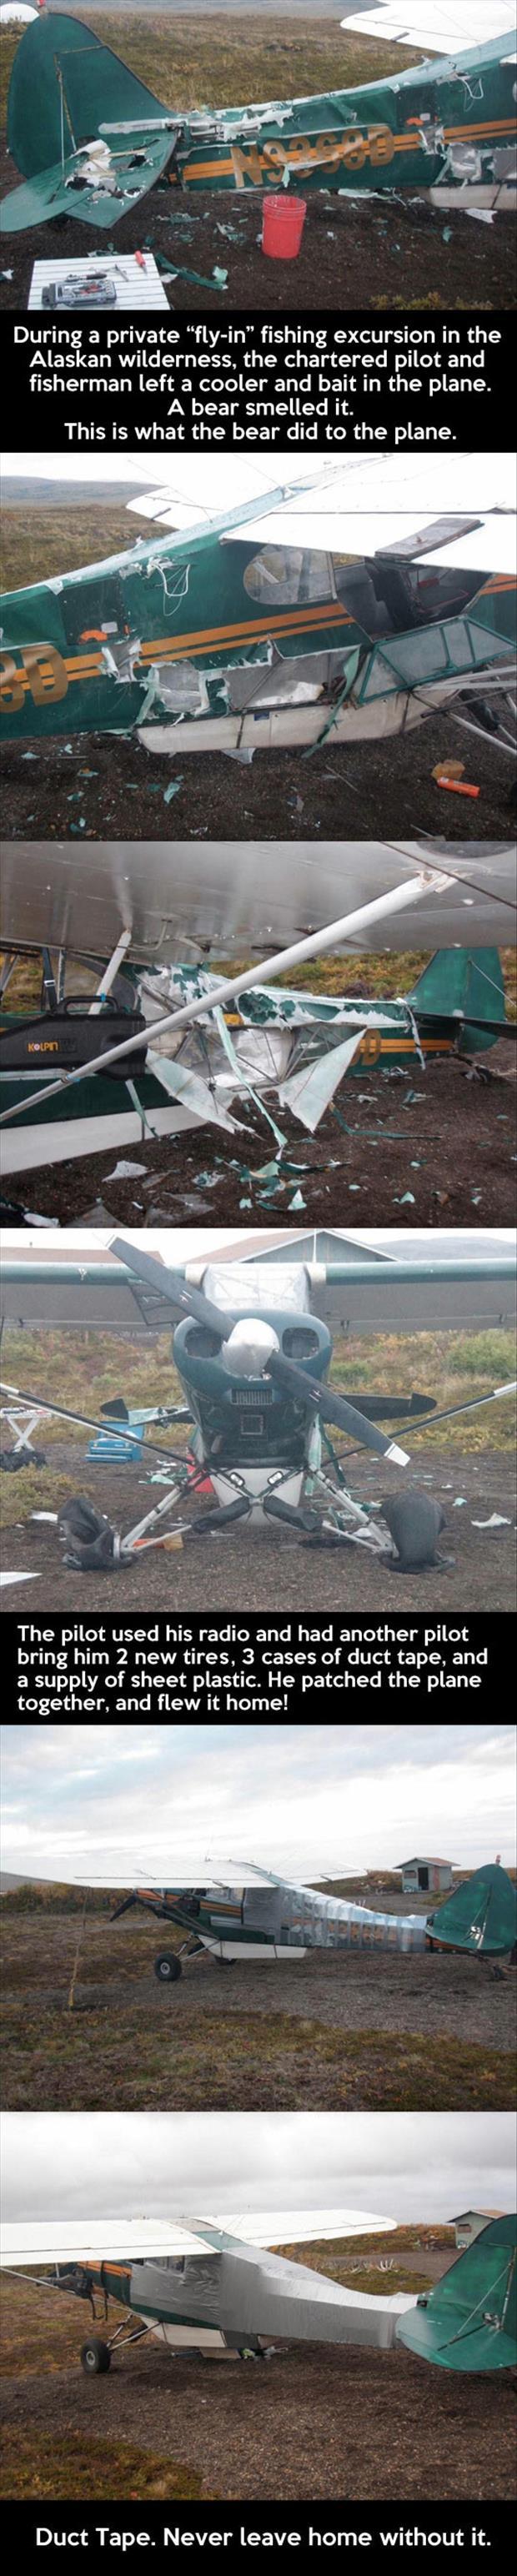 Bear, plane, duct tape